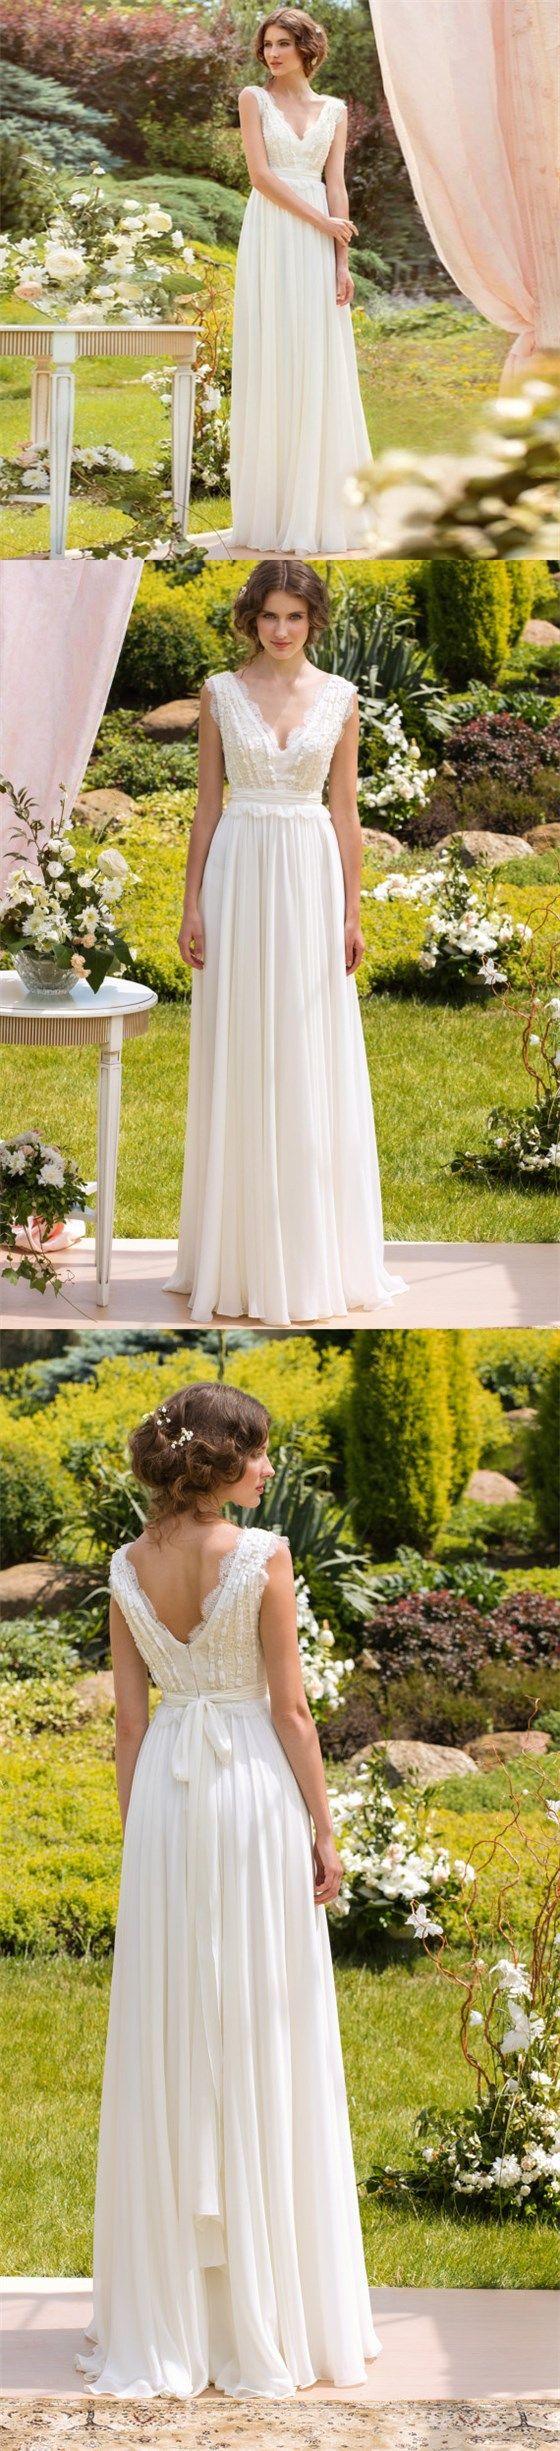 V Neck Long Simple Soft Fairy Pretty Charming Wedding dresses, Long Beach Wedding Gown, PD0310